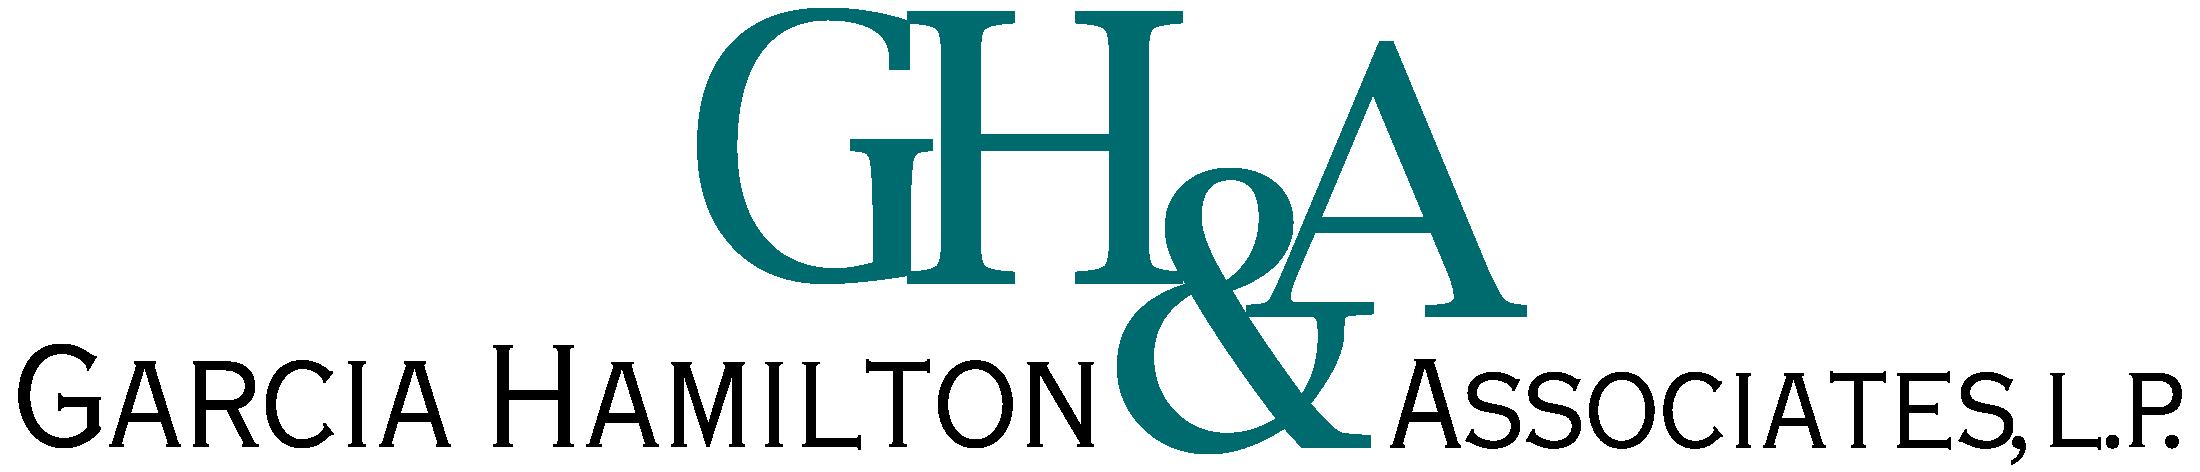 Garcia Hamilton & Associates, L.P. header image